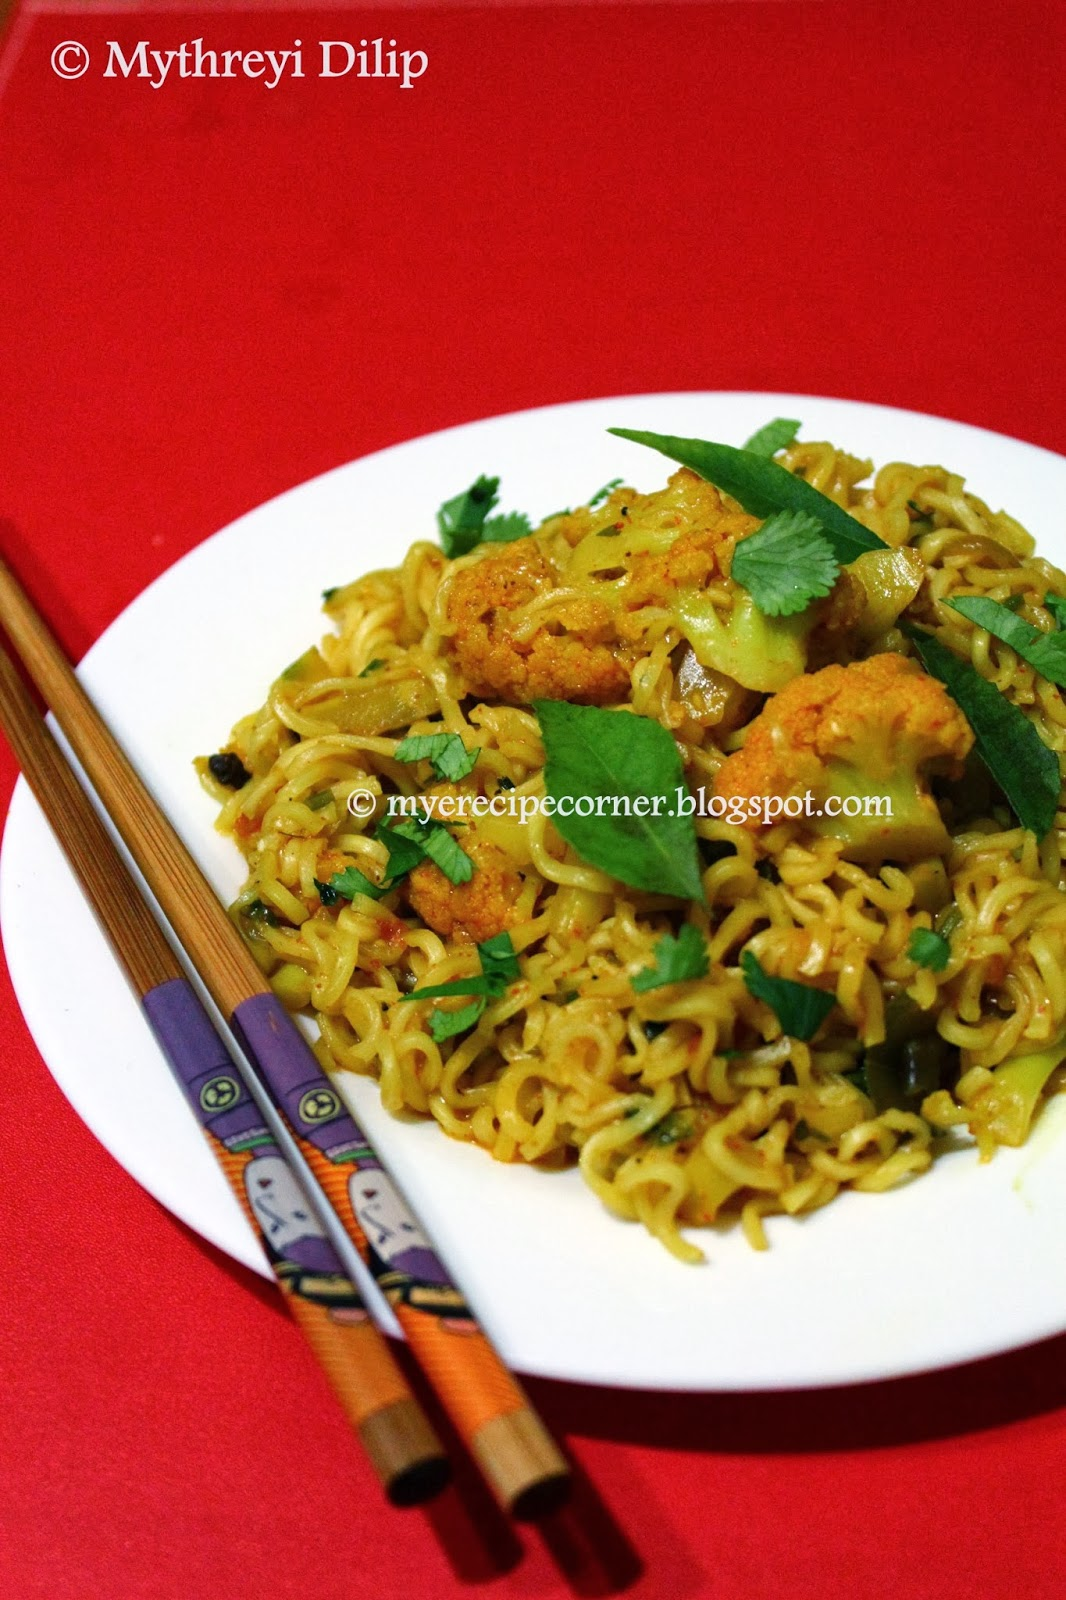 how to make maggi noodles taste better